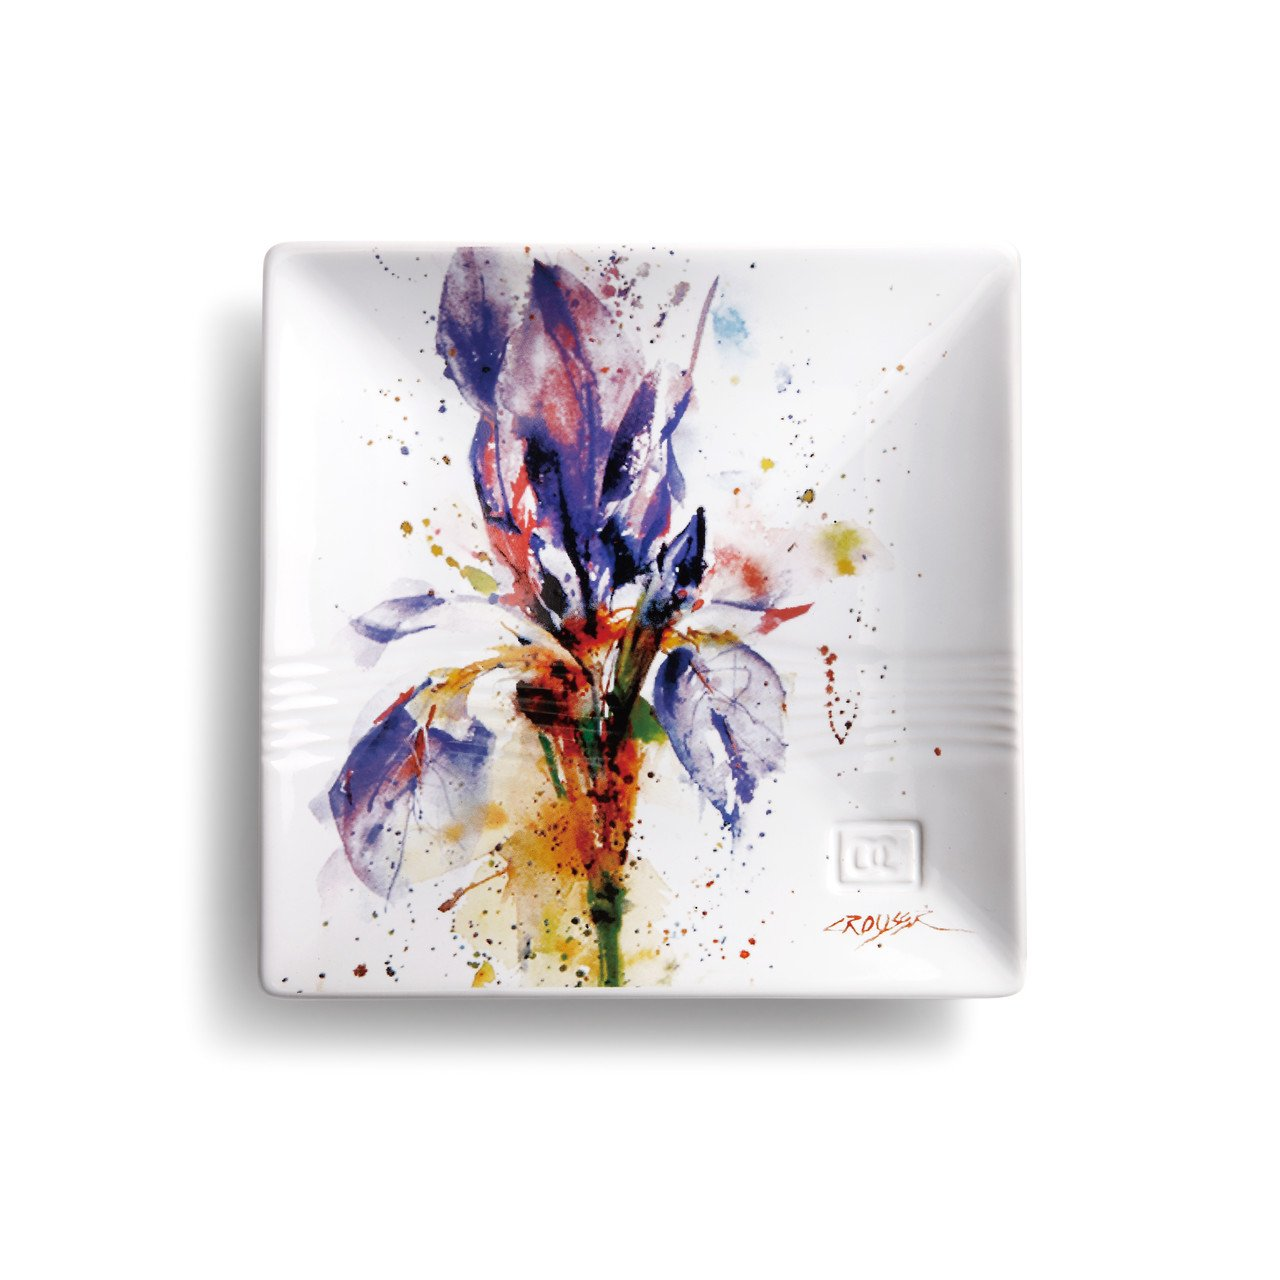 Demdaco 3005050987 Big Sky Carvers Iris Snack Plate, Multicolored